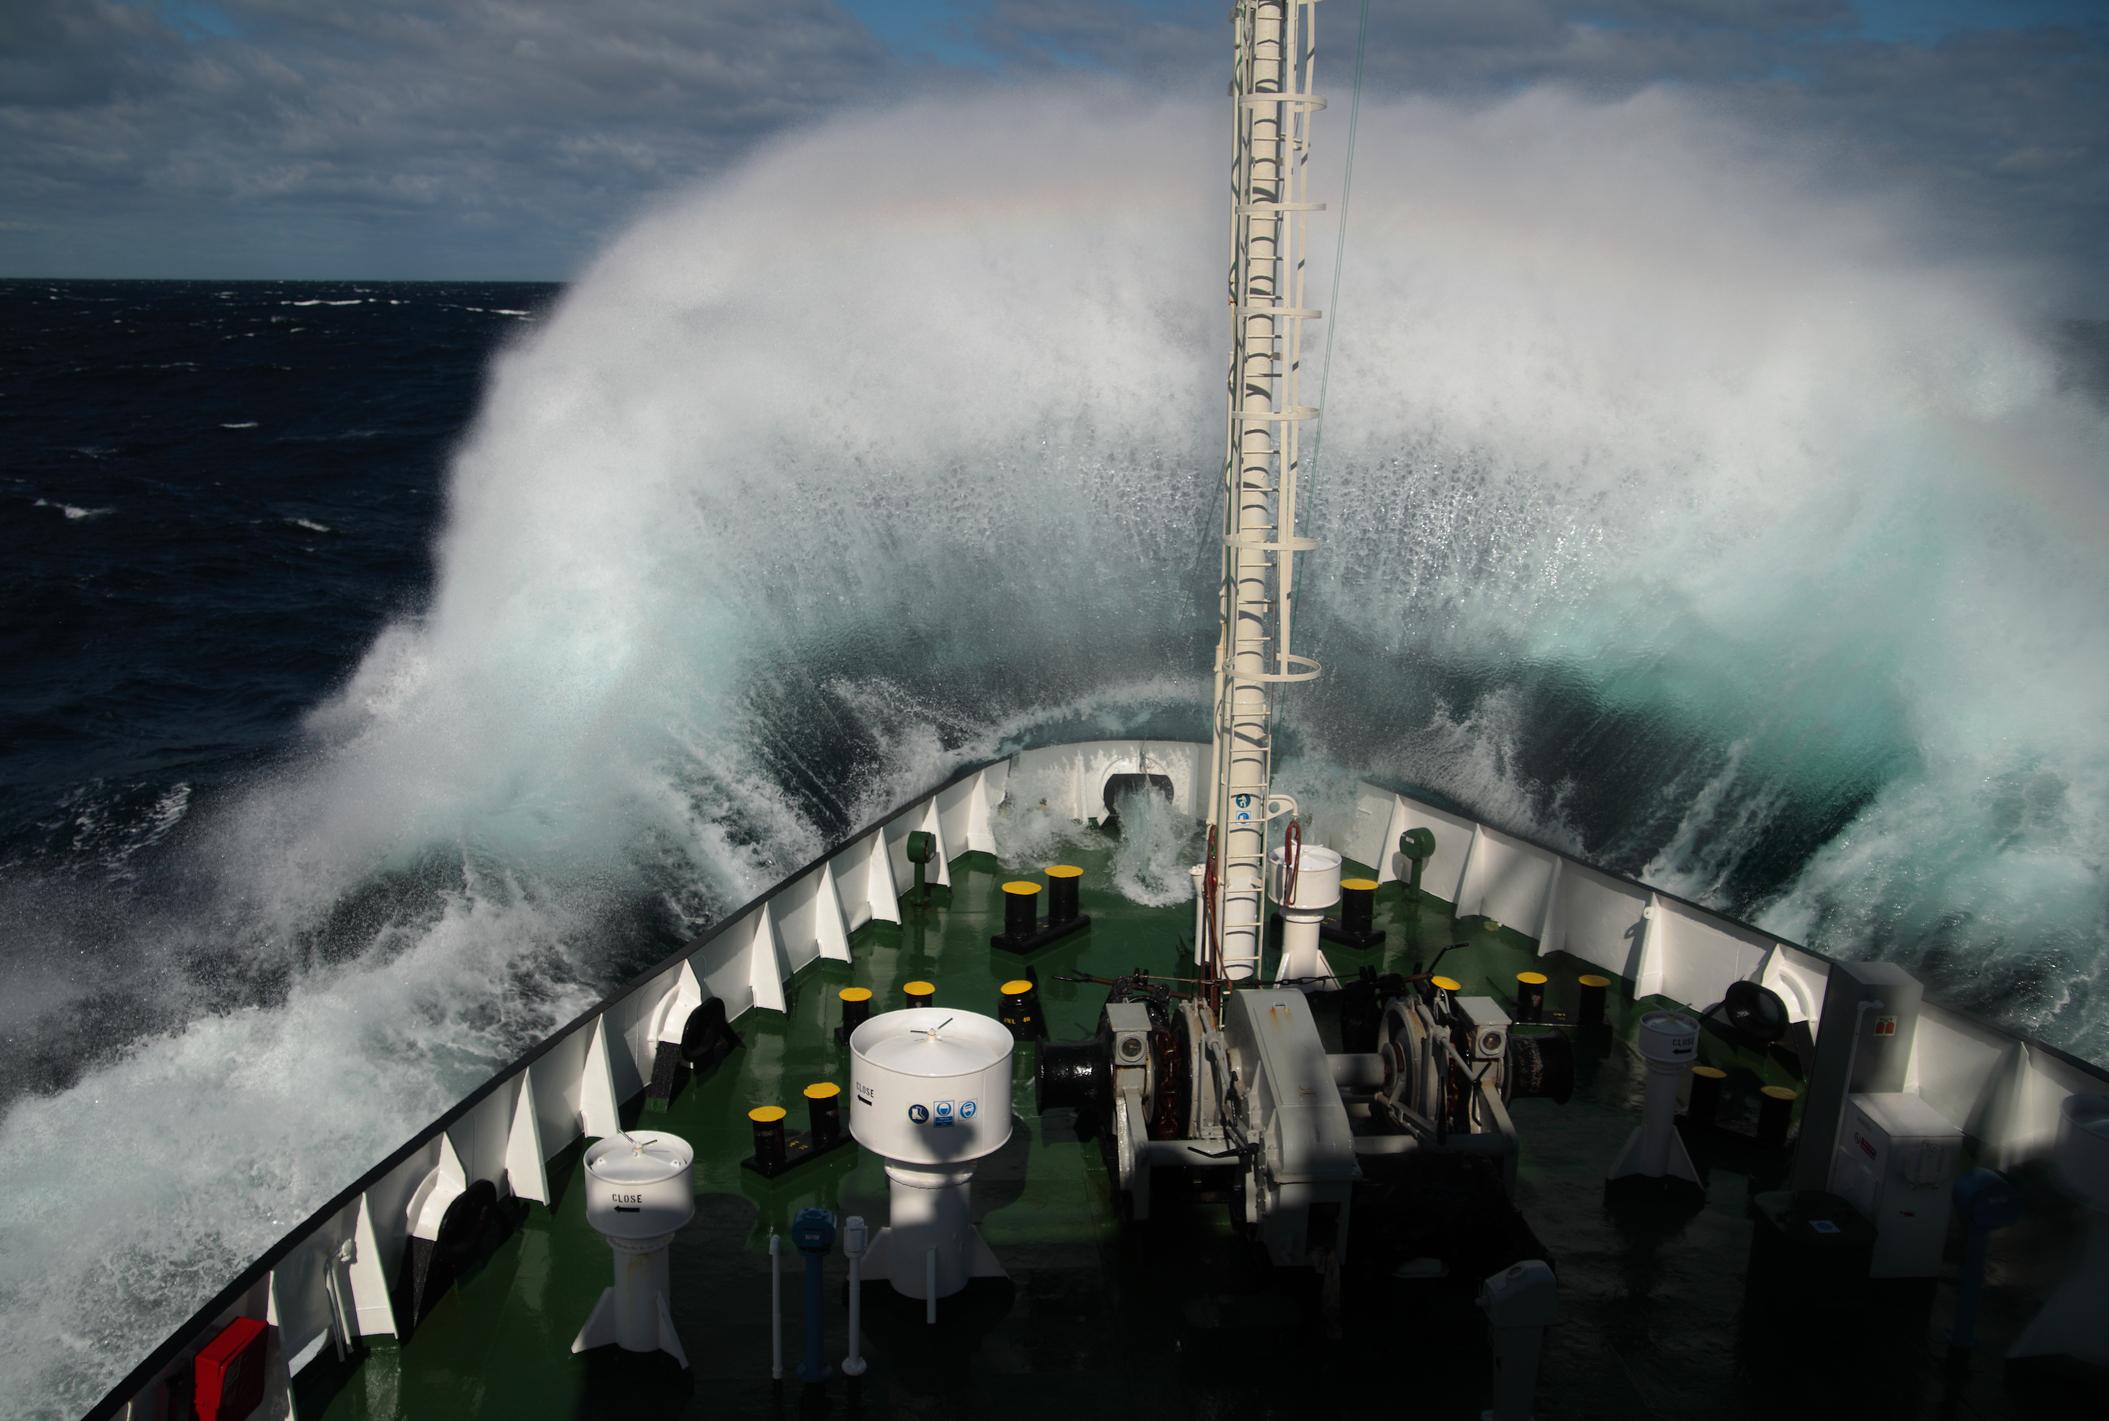 Norwegian Cruise Lines Sinks as Revenue Plummets 99%